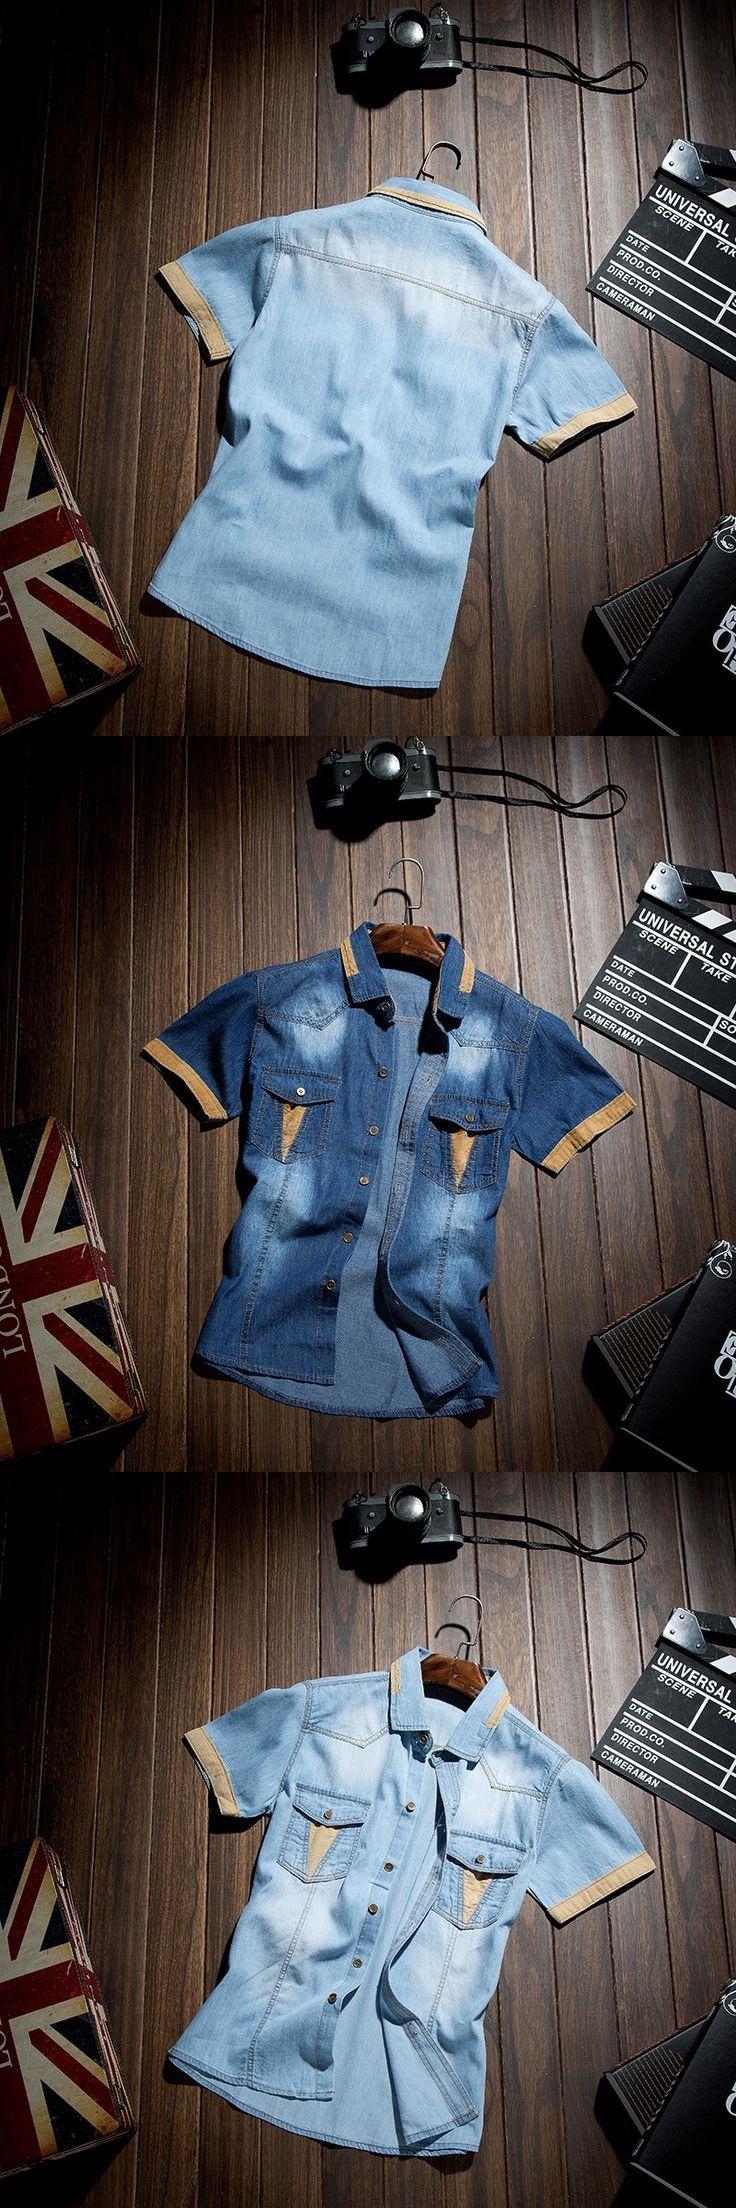 2017 Summer New Casual Slim Fit Camisa Mezclilla Hombre Short-sleeved Trendy Style Jeans Men Shirts Denim